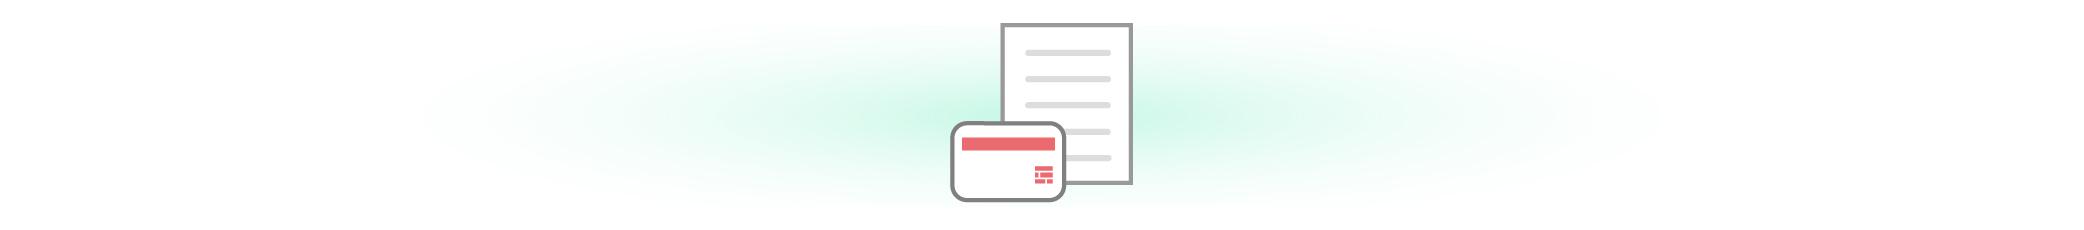 Your Credit Report-01.jpg